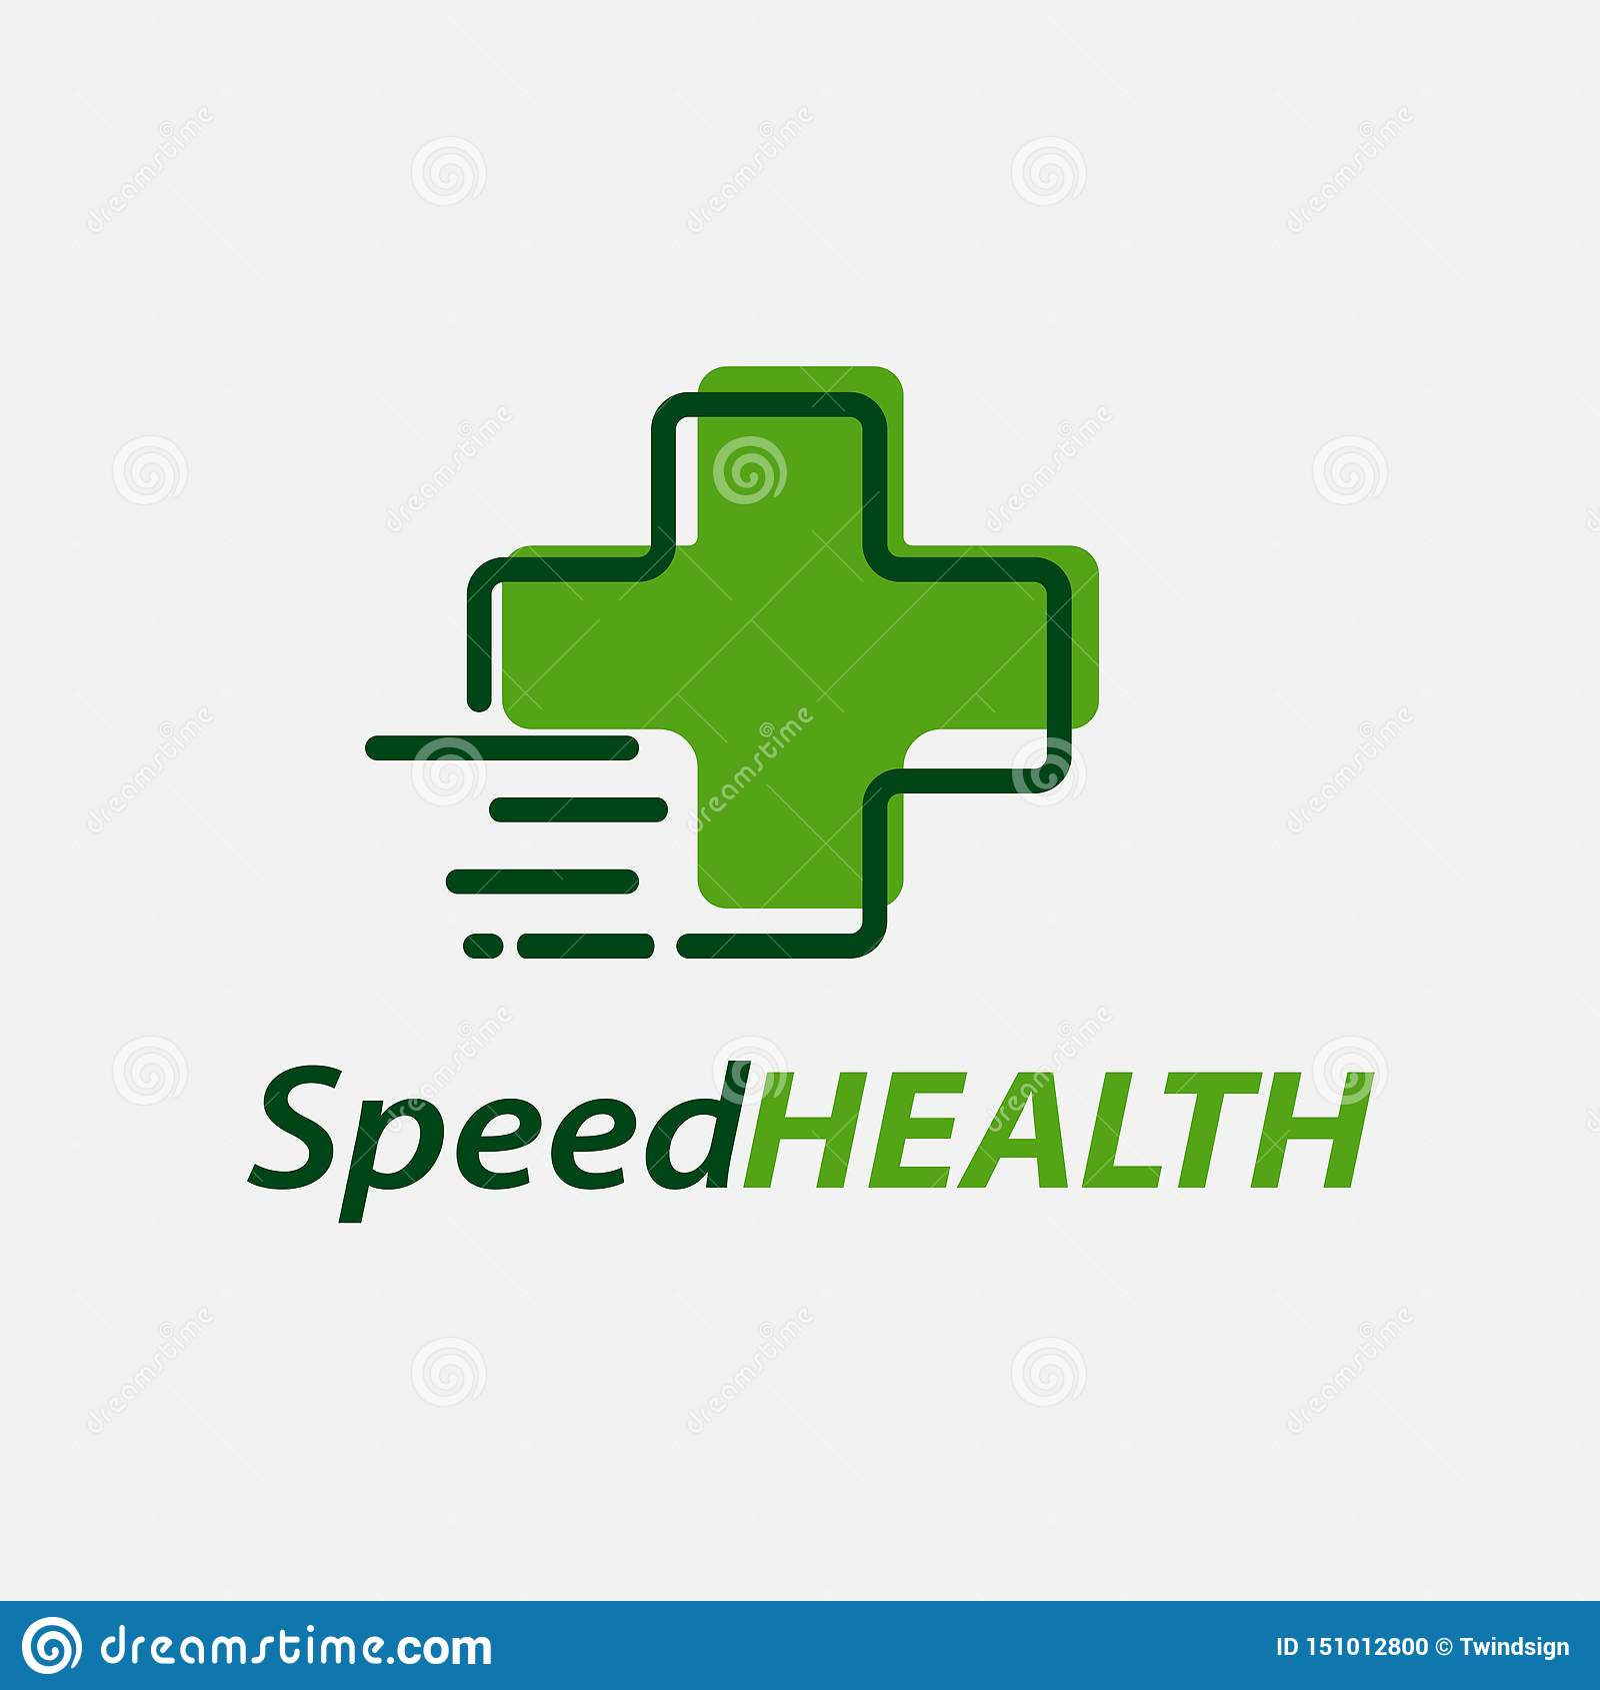 Molde do vetor do projeto do logotipo da saúde da velocidade